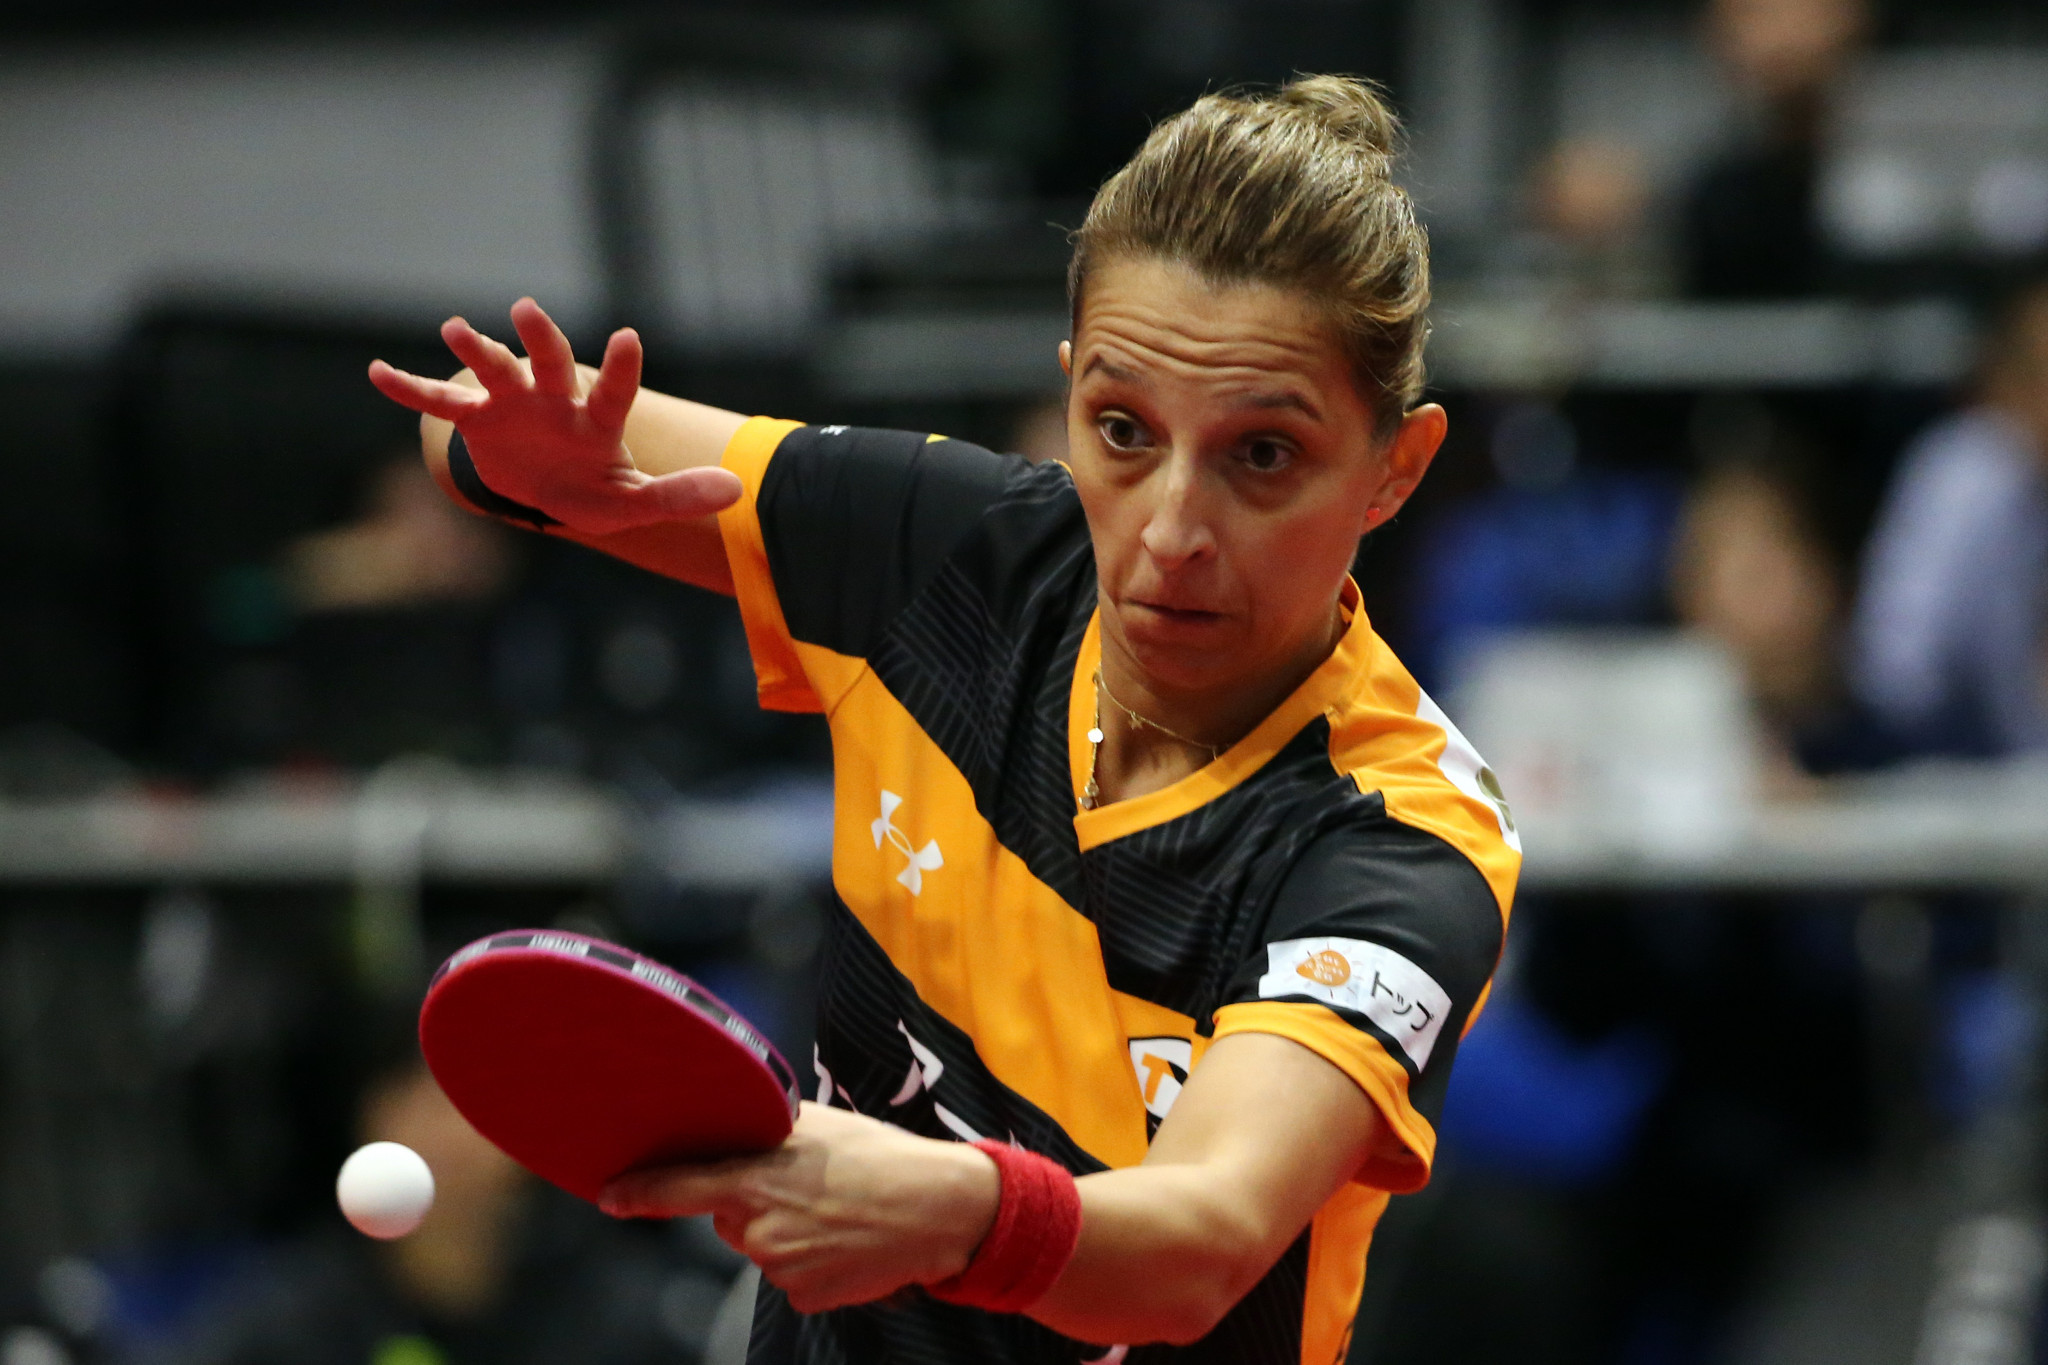 Defending champions Romania reach European Table Tennis Championships final